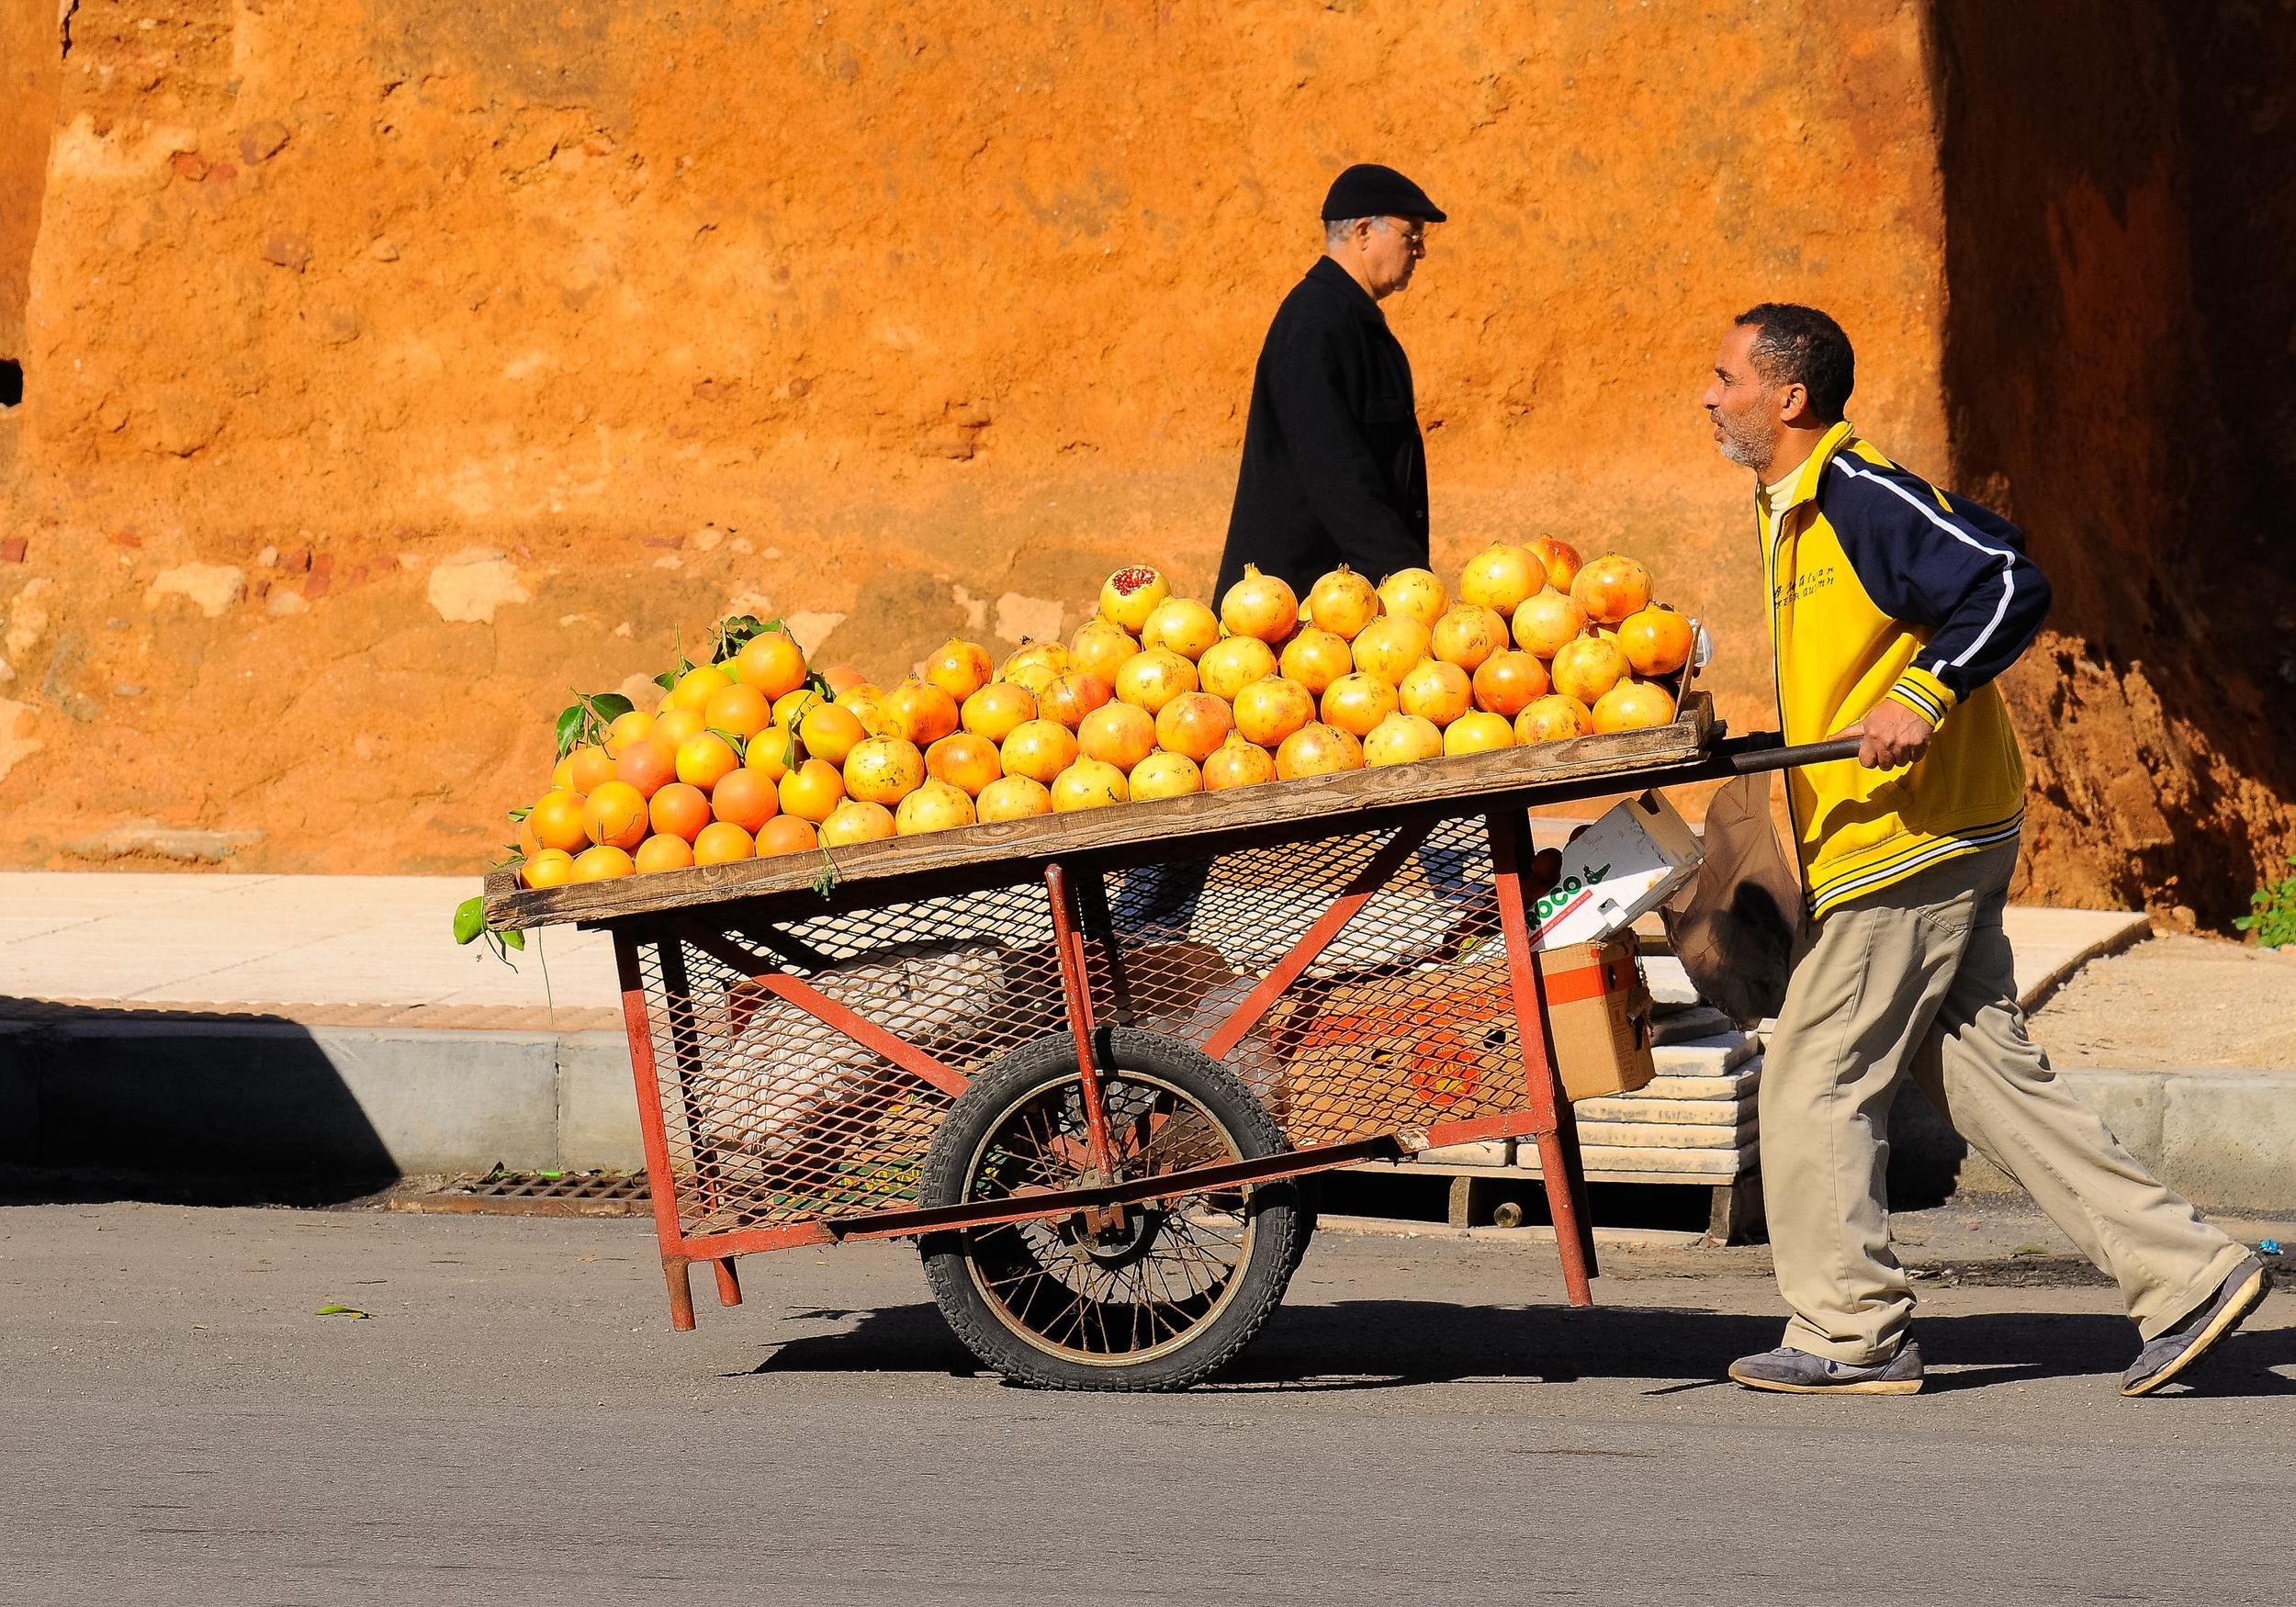 Oranges in Casablanca Photo by Eduardo C.G on Unsplash